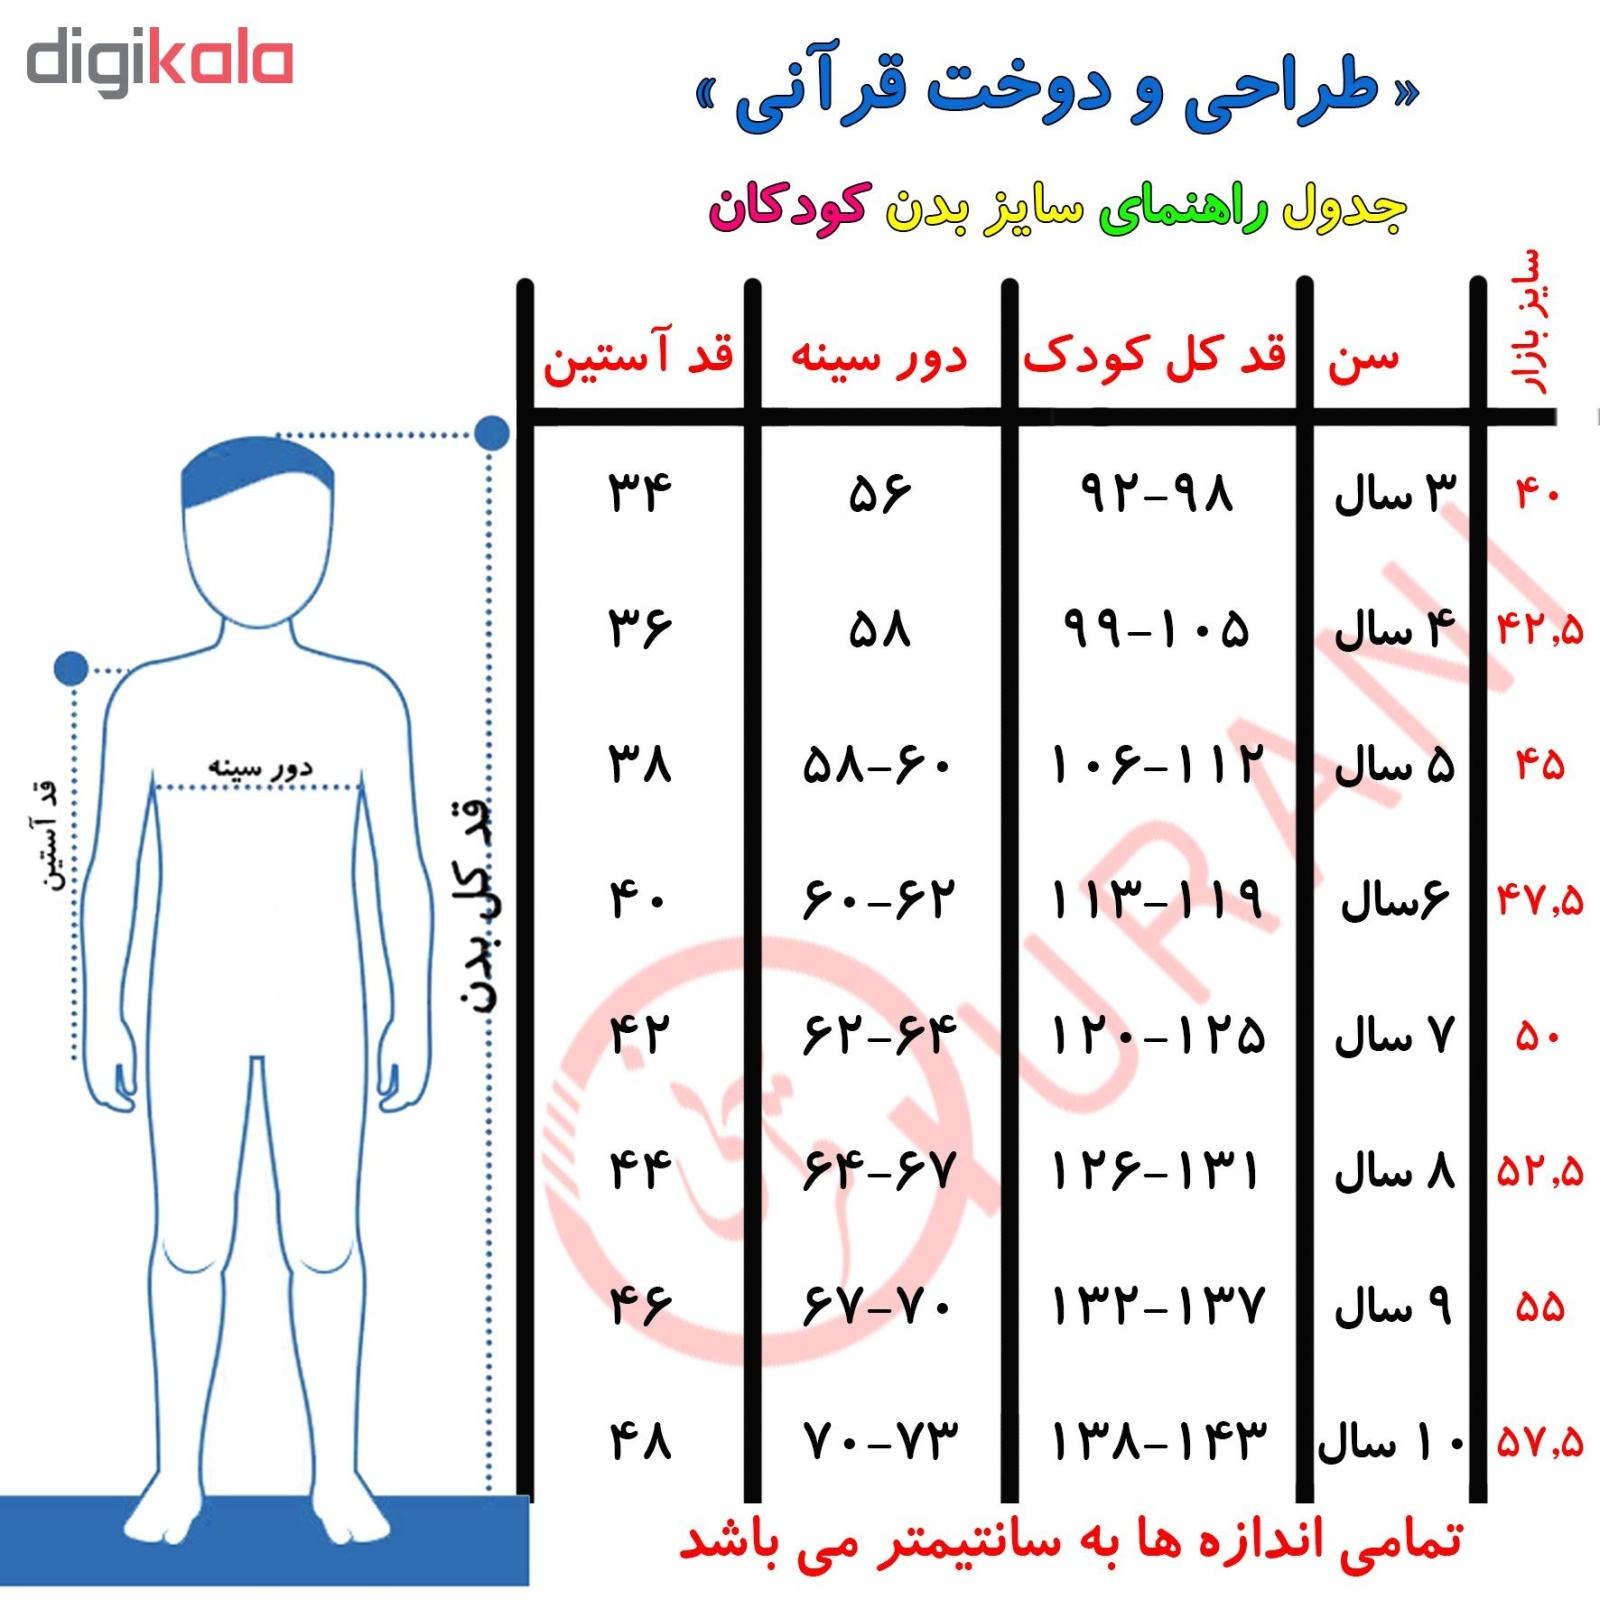 کت تک پسرانه قرآنی مدل C03toos -  - 4